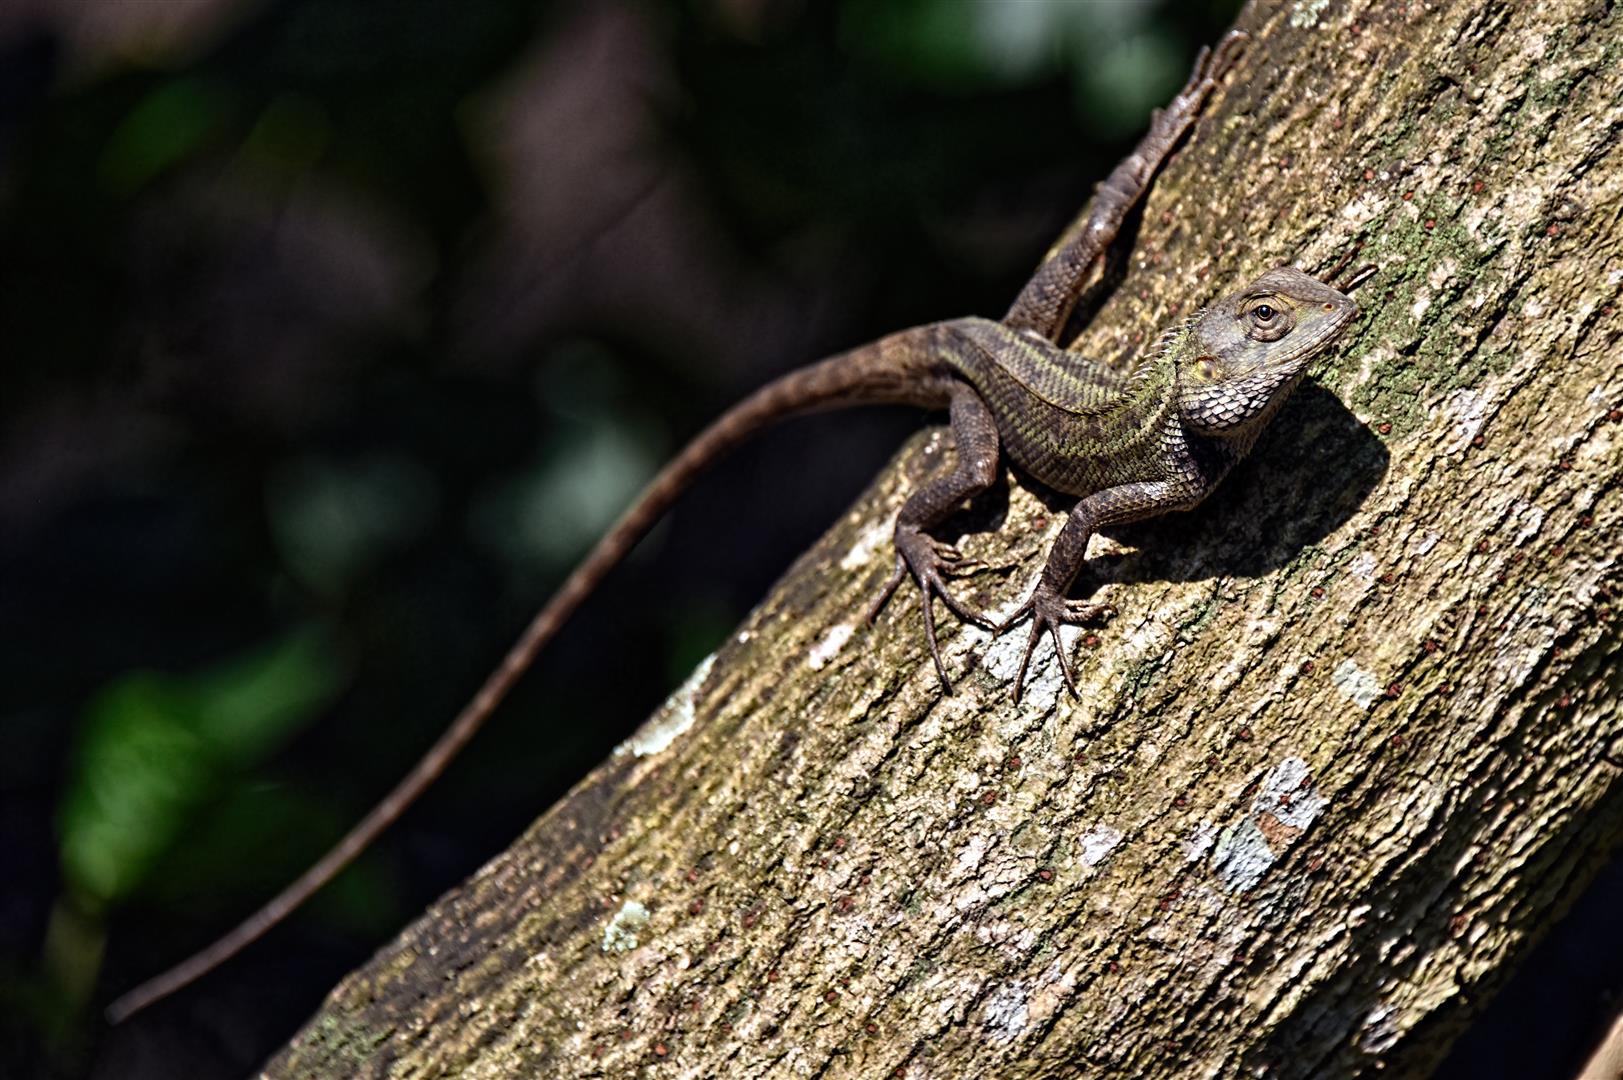 Sungei Buloh Lizard (2)